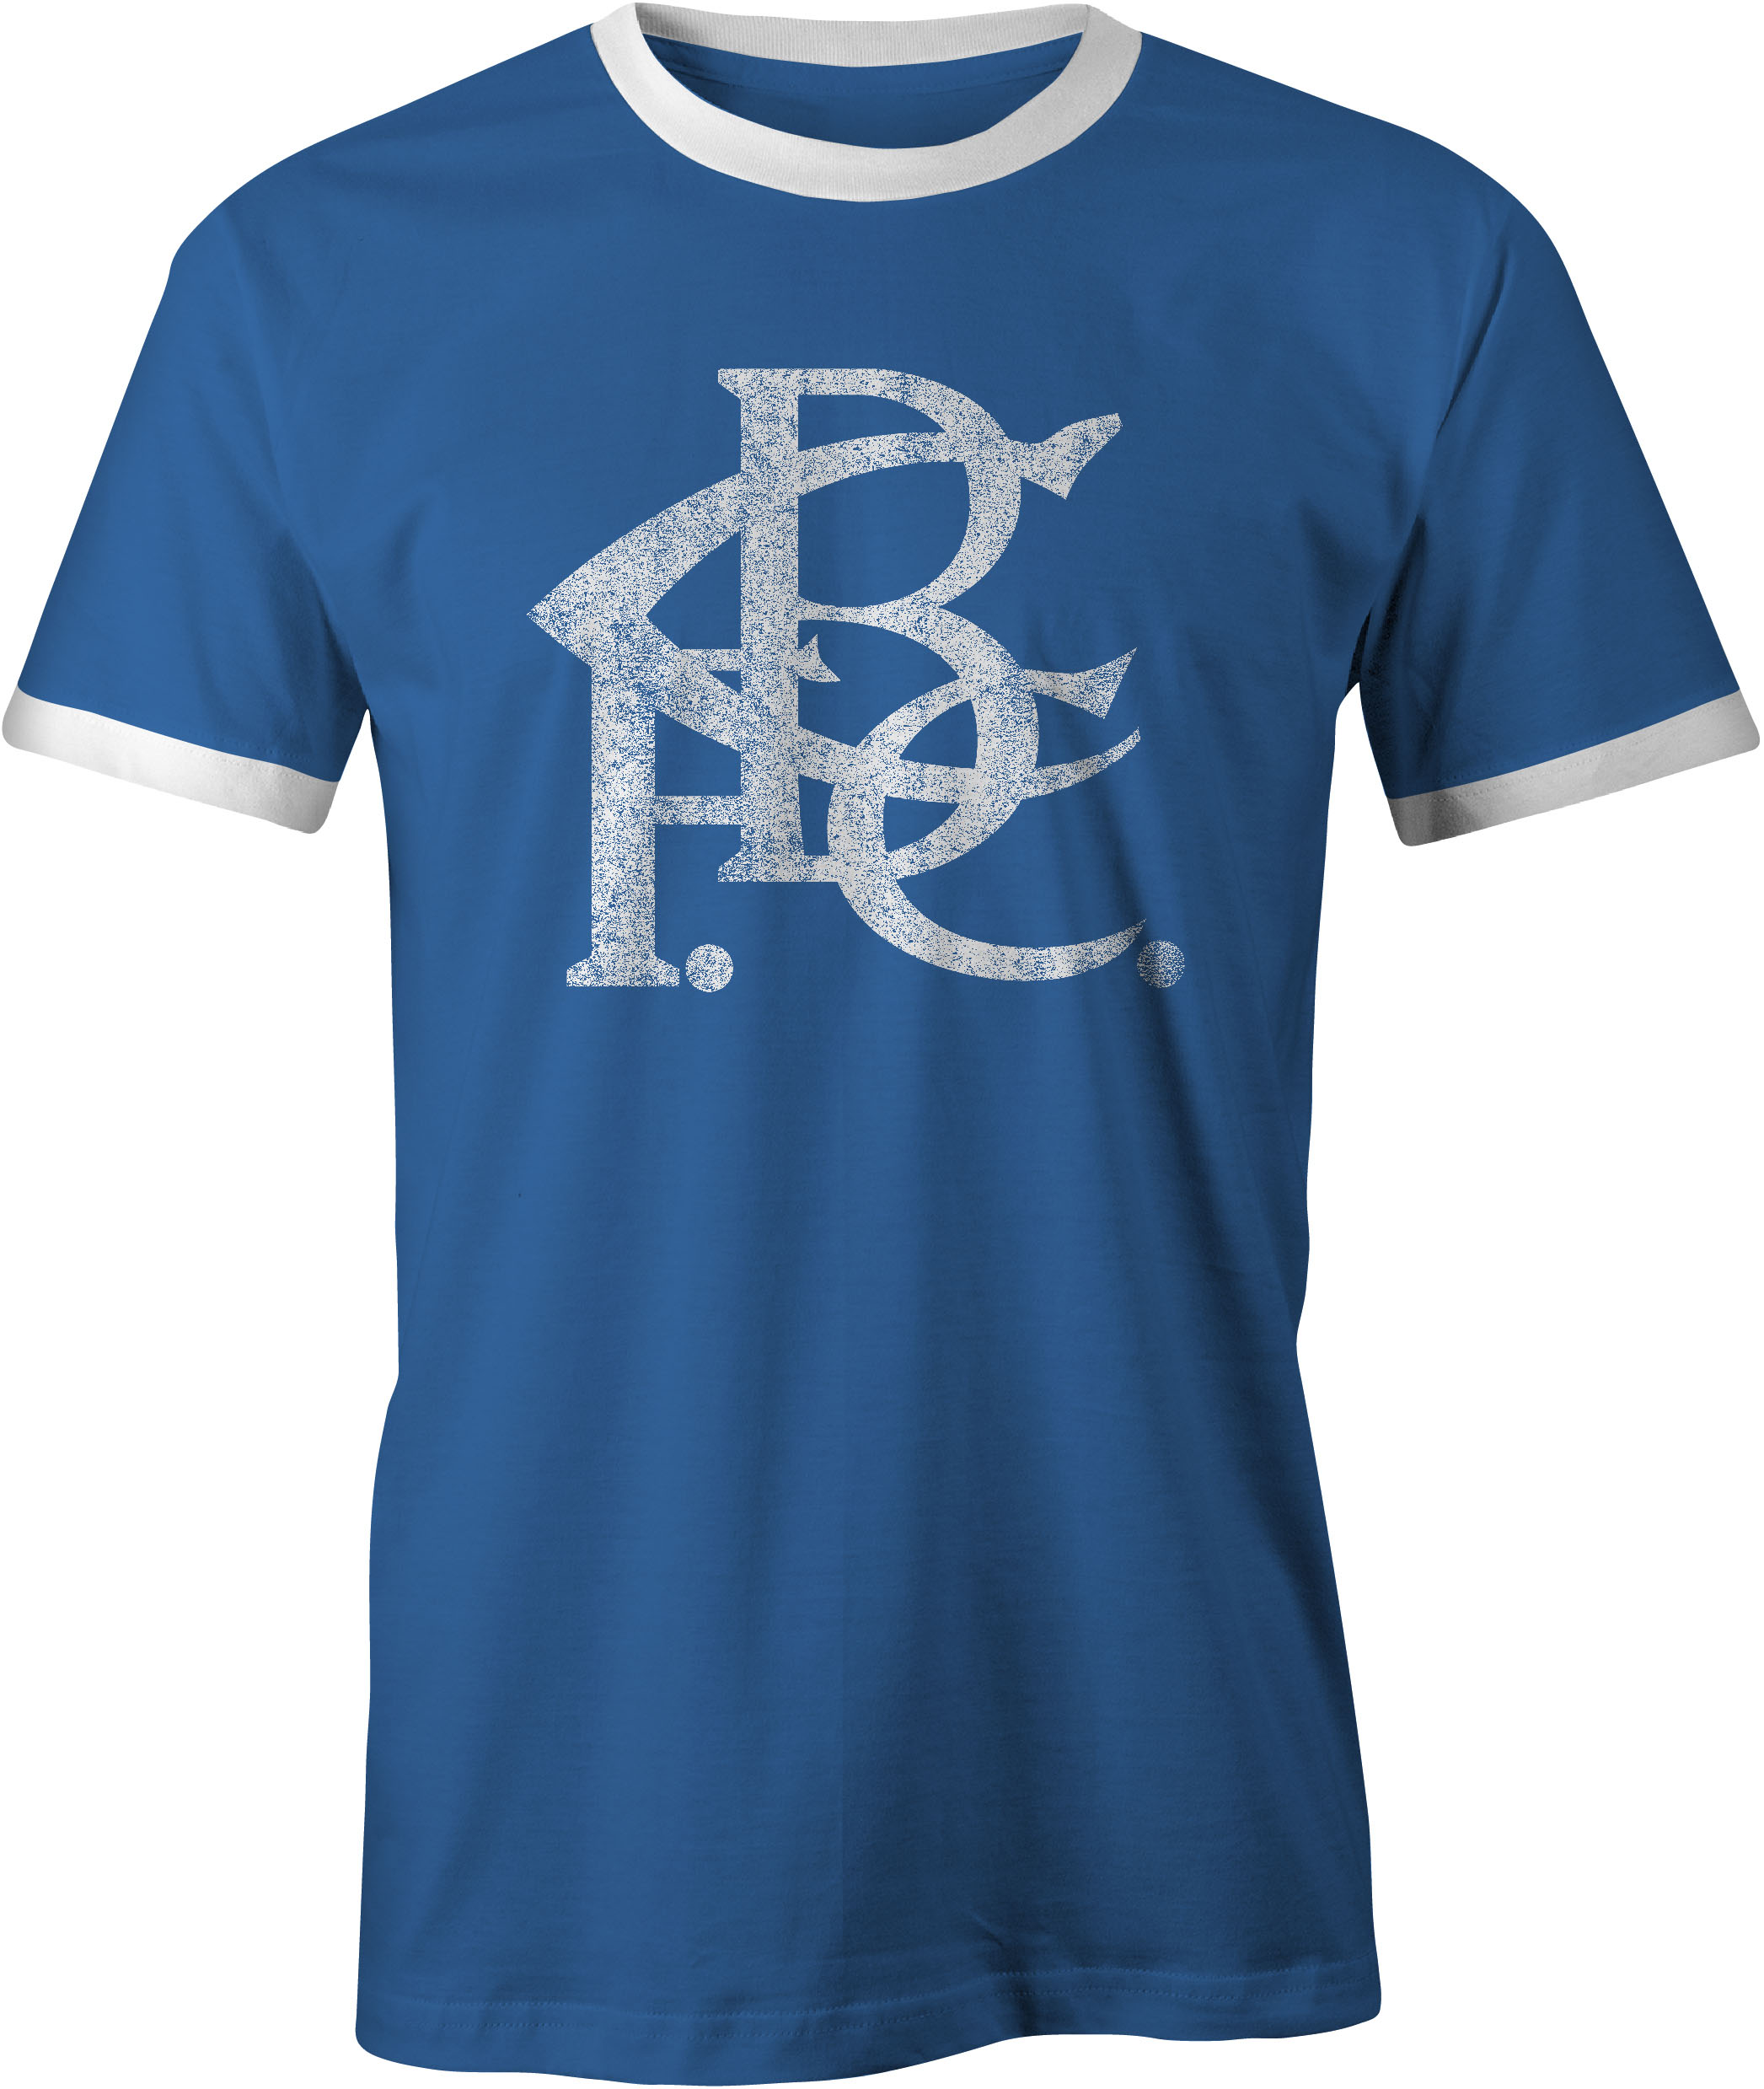 Birmingham City FC Old Style Vintage Printed T-Shirt